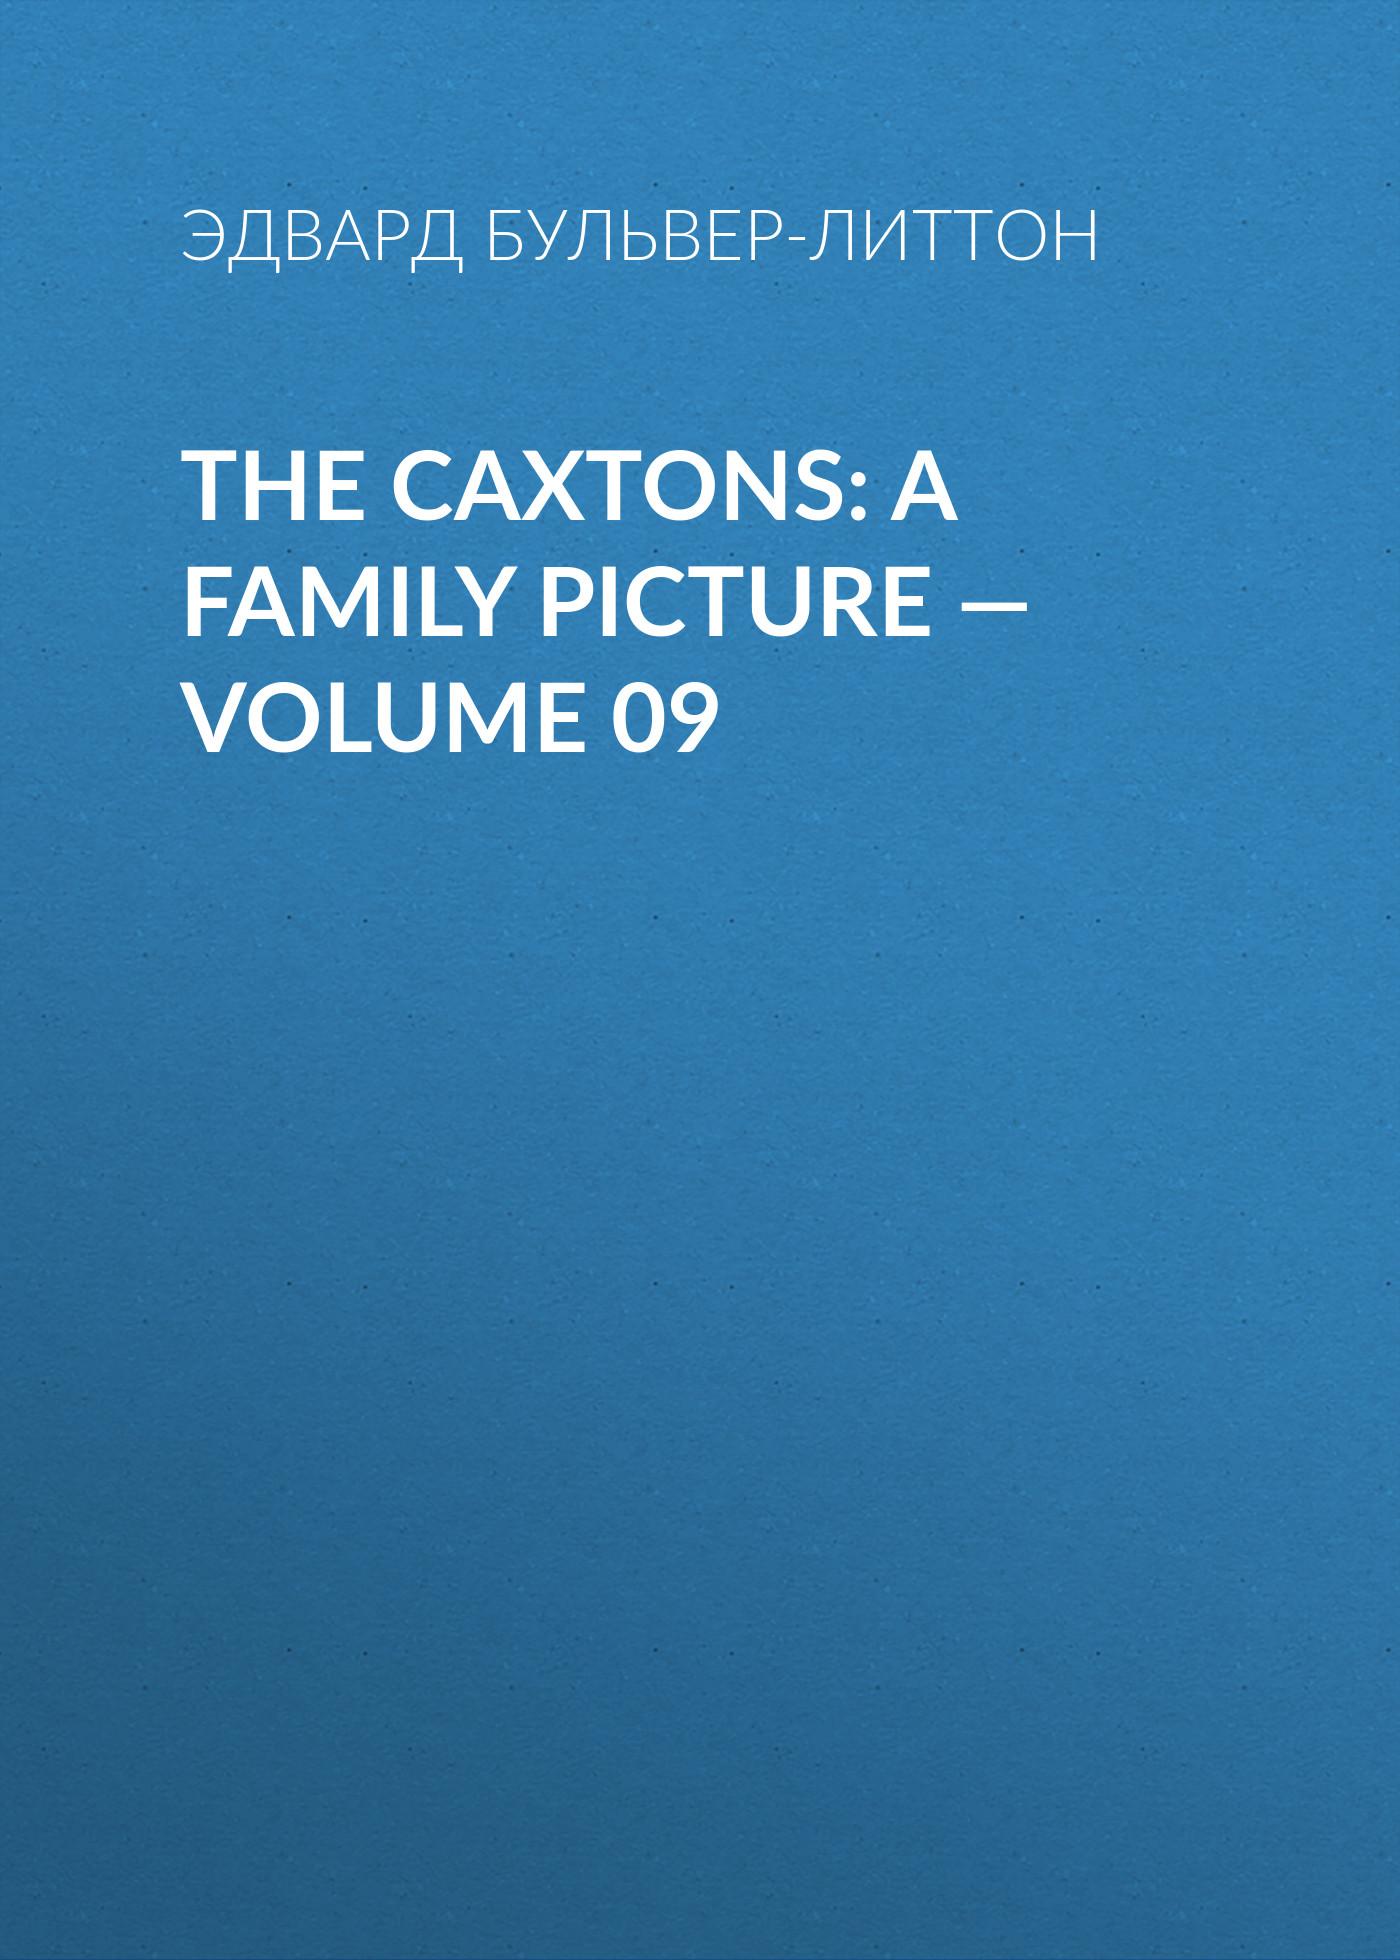 Эдвард Бульвер-Литтон The Caxtons: A Family Picture — Volume 09 creepy comics volume 4 family values